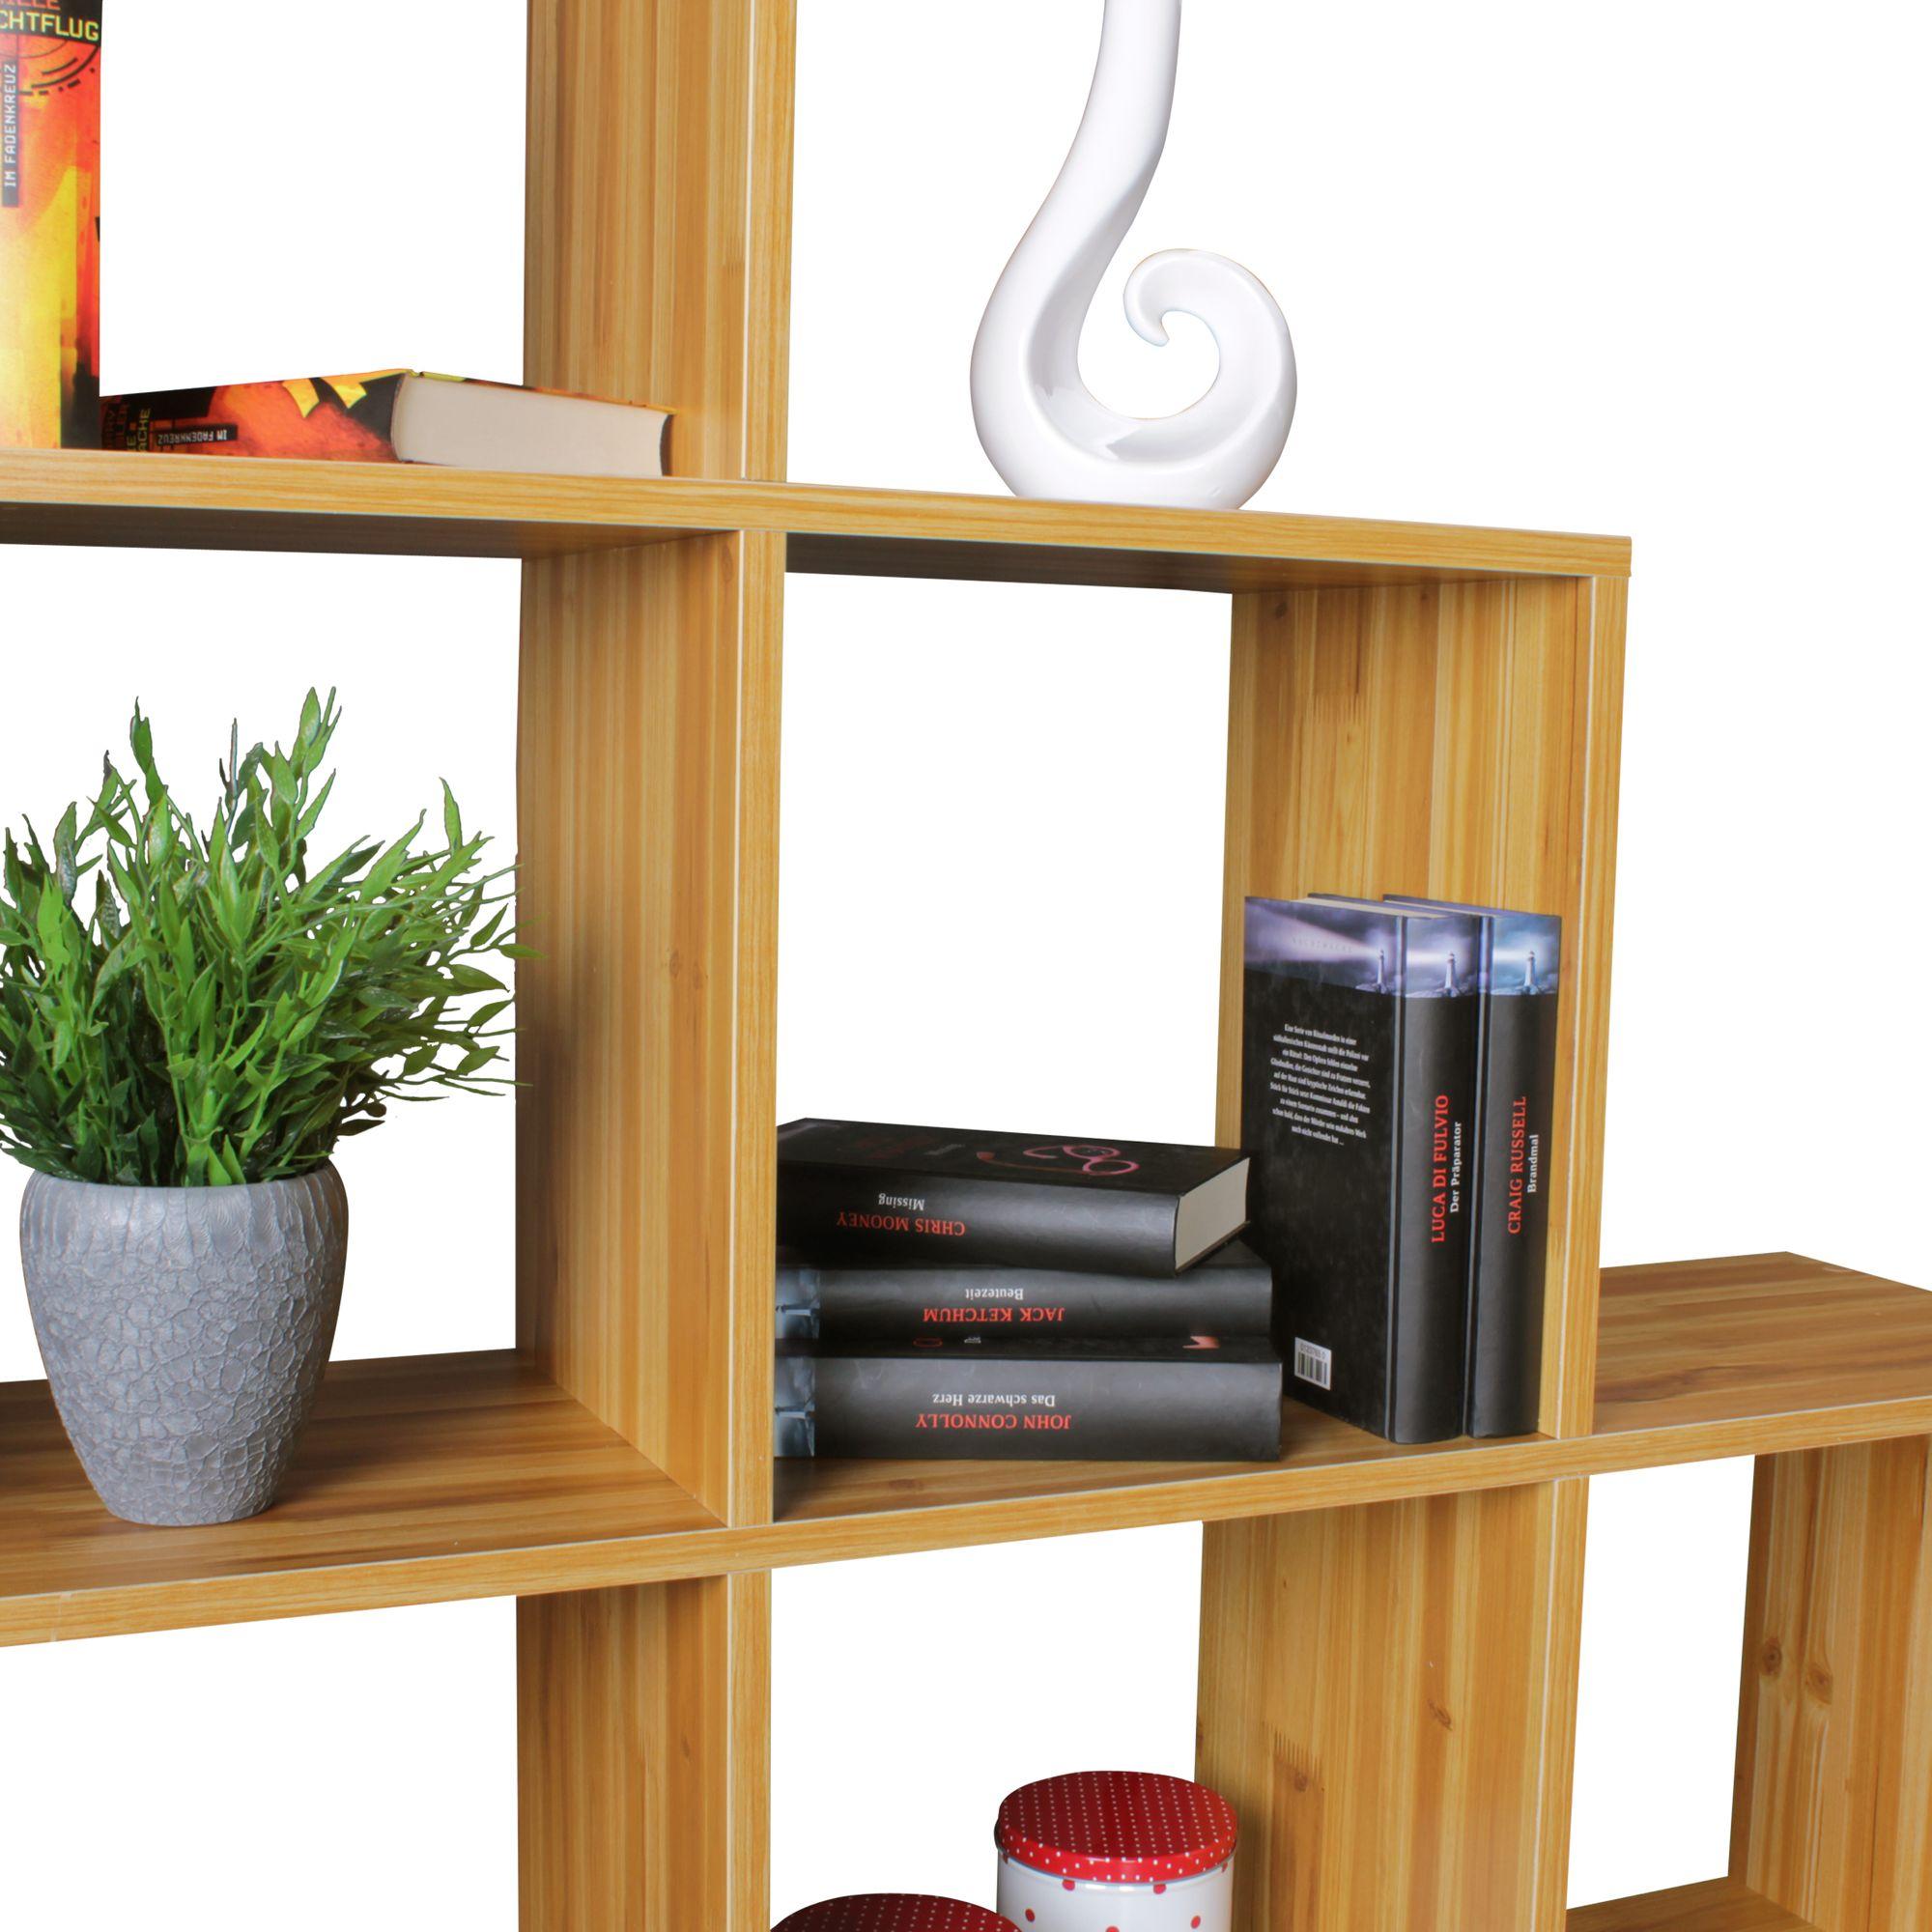 stufenregal buche f cher standregal raumteiler treppenregal b cherregal regal ebay. Black Bedroom Furniture Sets. Home Design Ideas